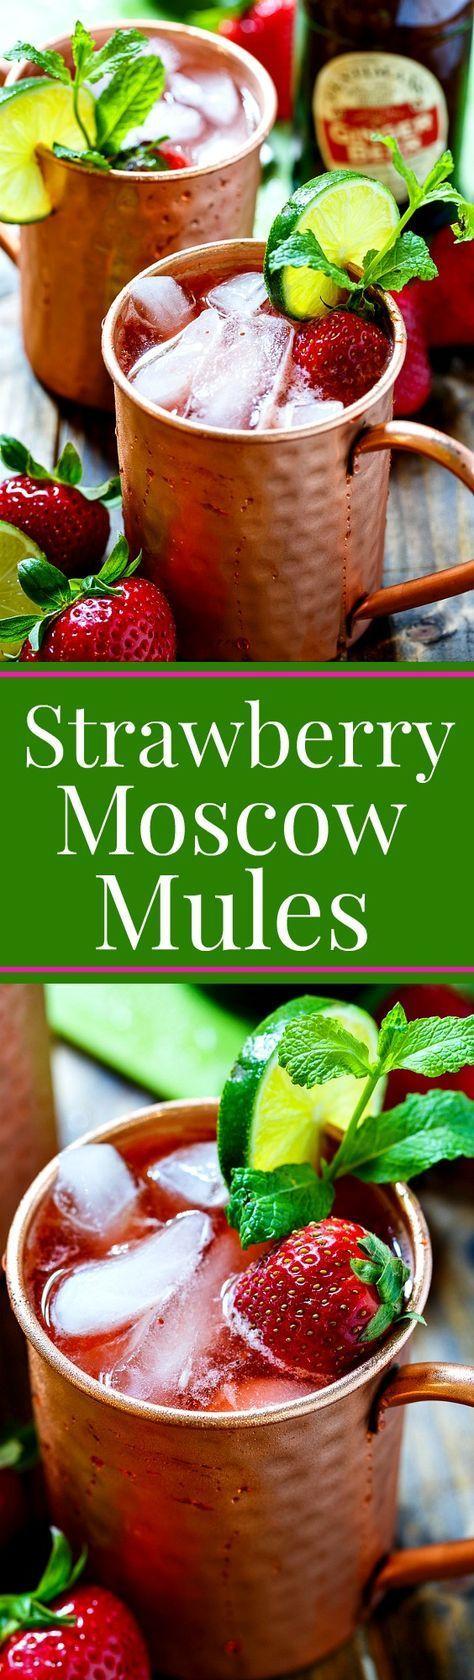 Strawberry Moscow Mule, #Moscow #Mule #Strawberry